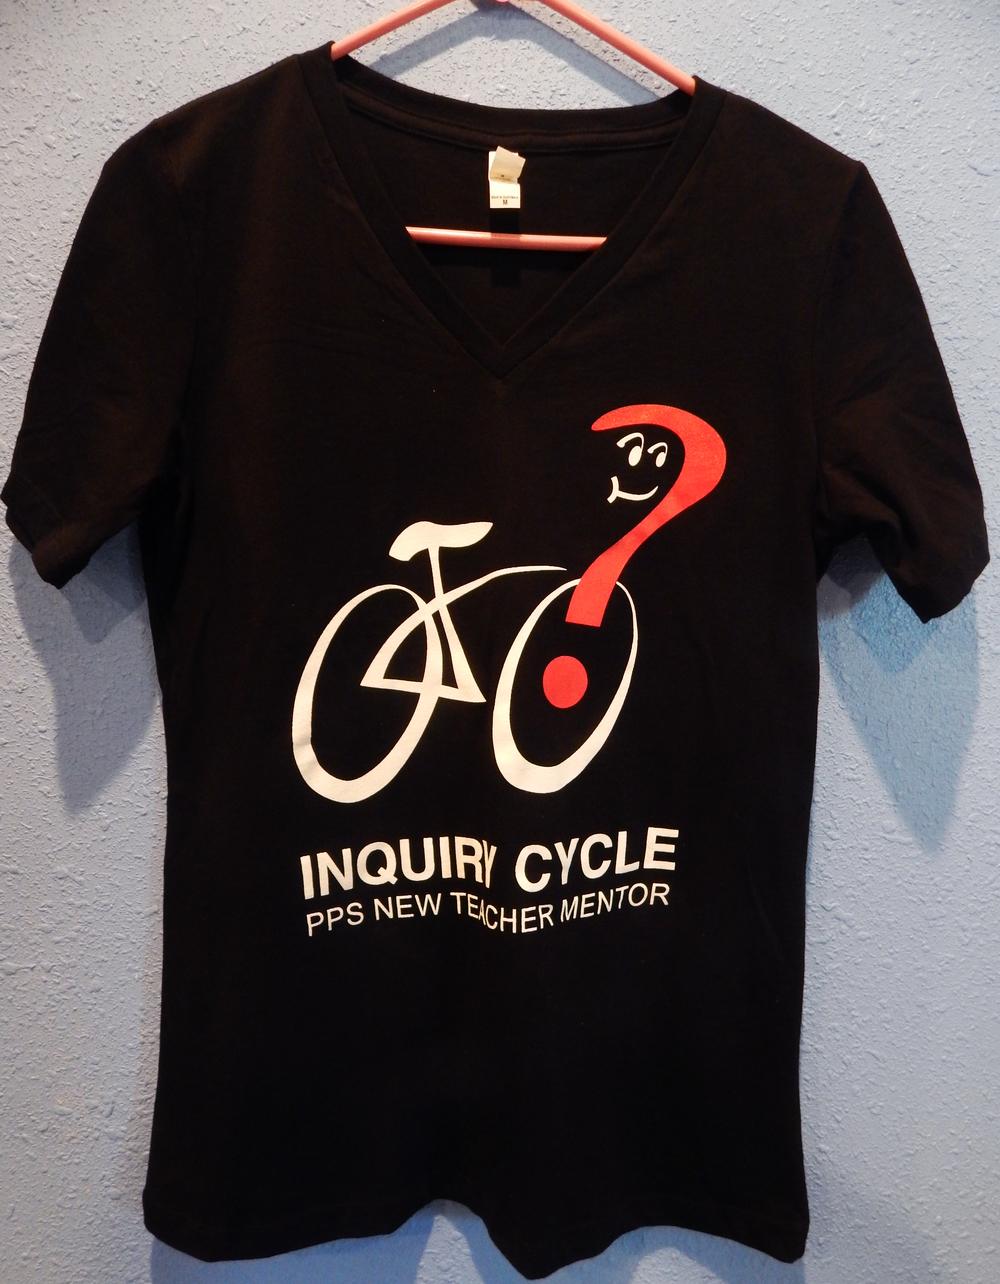 inquirey cycle.jpg